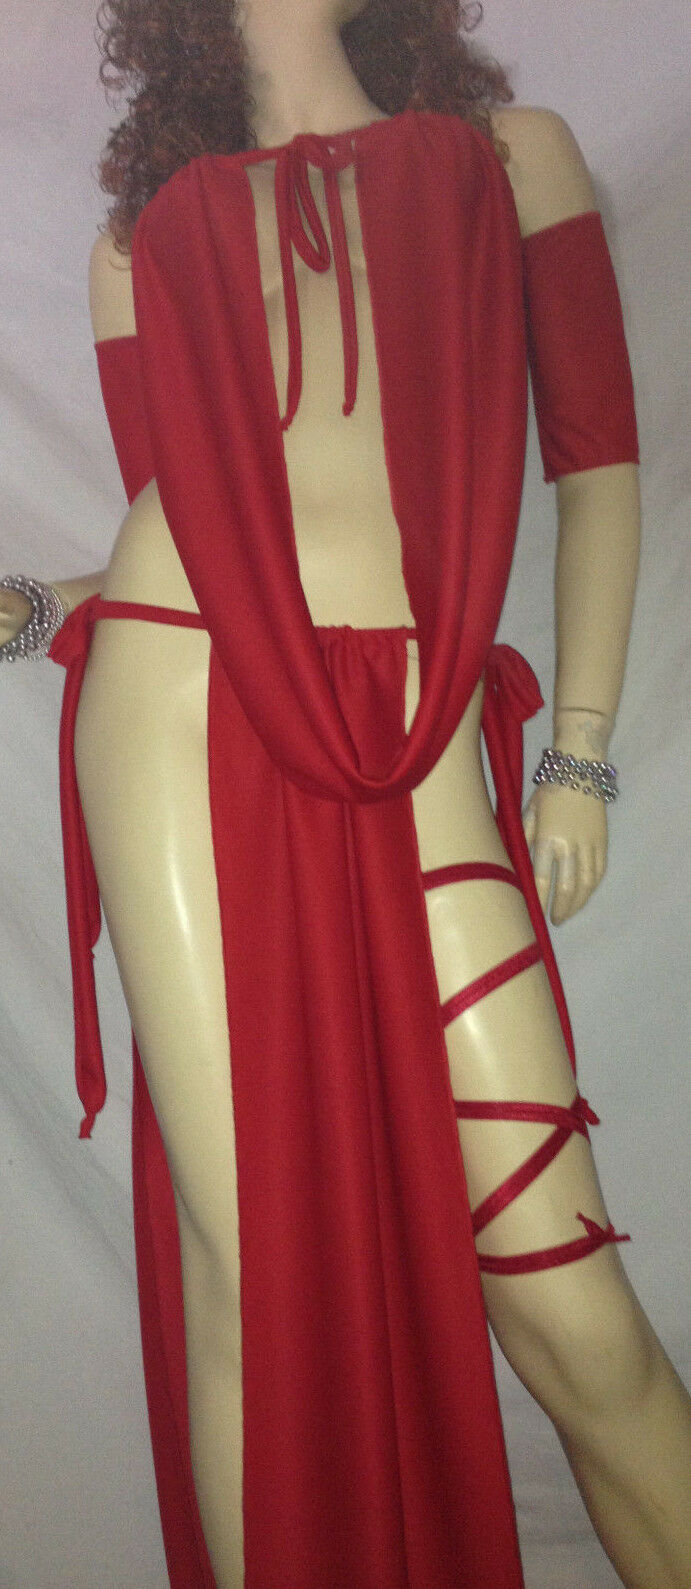 PLUS PRINCESS LONG GOWN SLAVE SILKS GOREAN COSTUME KAJIRA COSPLAY CLUBWEAR RED